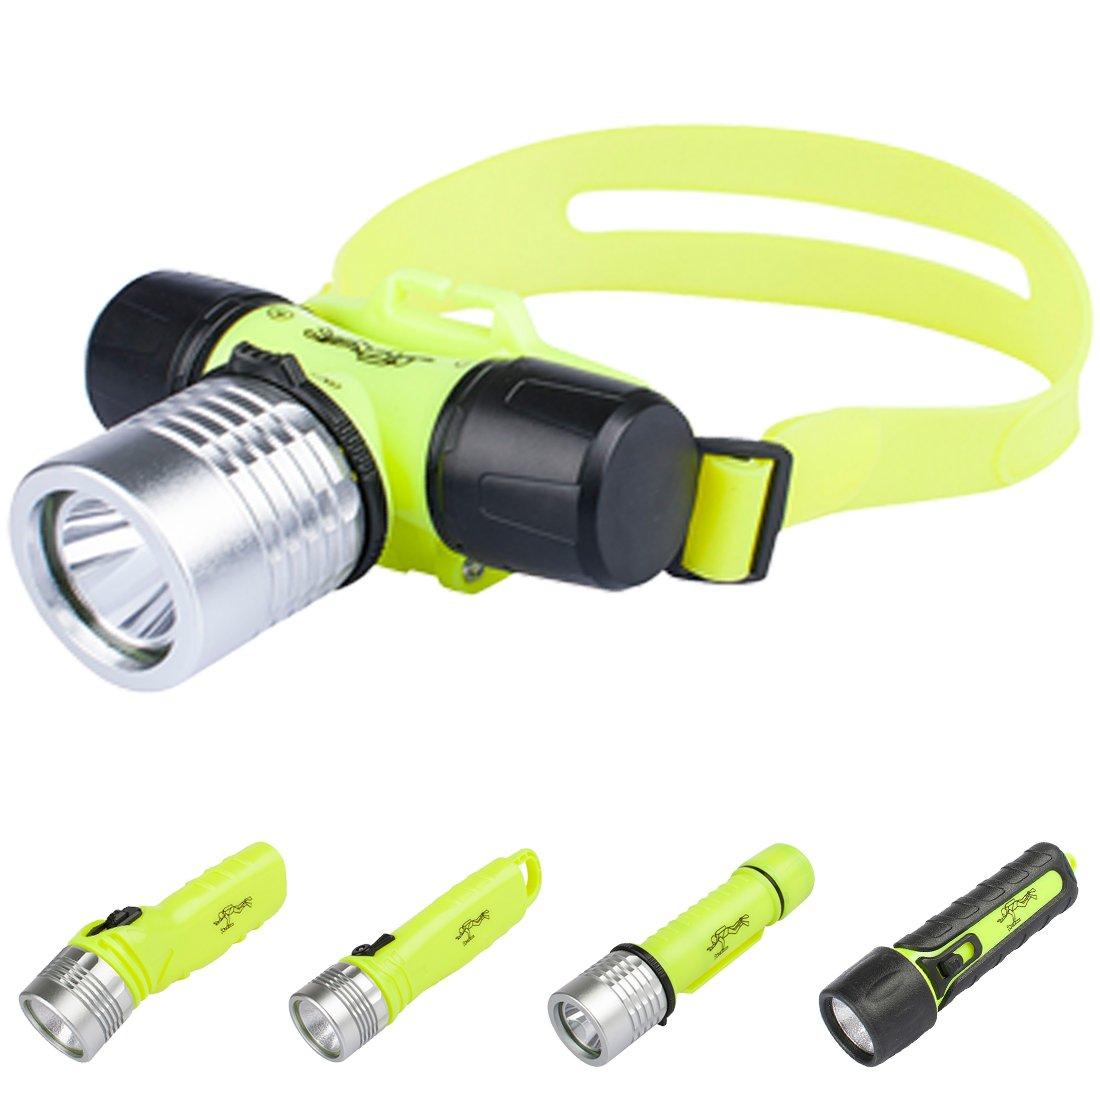 Three trees Underwater Diving Headlamp,3W 110 Lumens Waterproof LED Light,Slide Switch Safety Waterroof Underwater Buckle Headlamp,For Scuba Diving Outdoor Under Water Sports